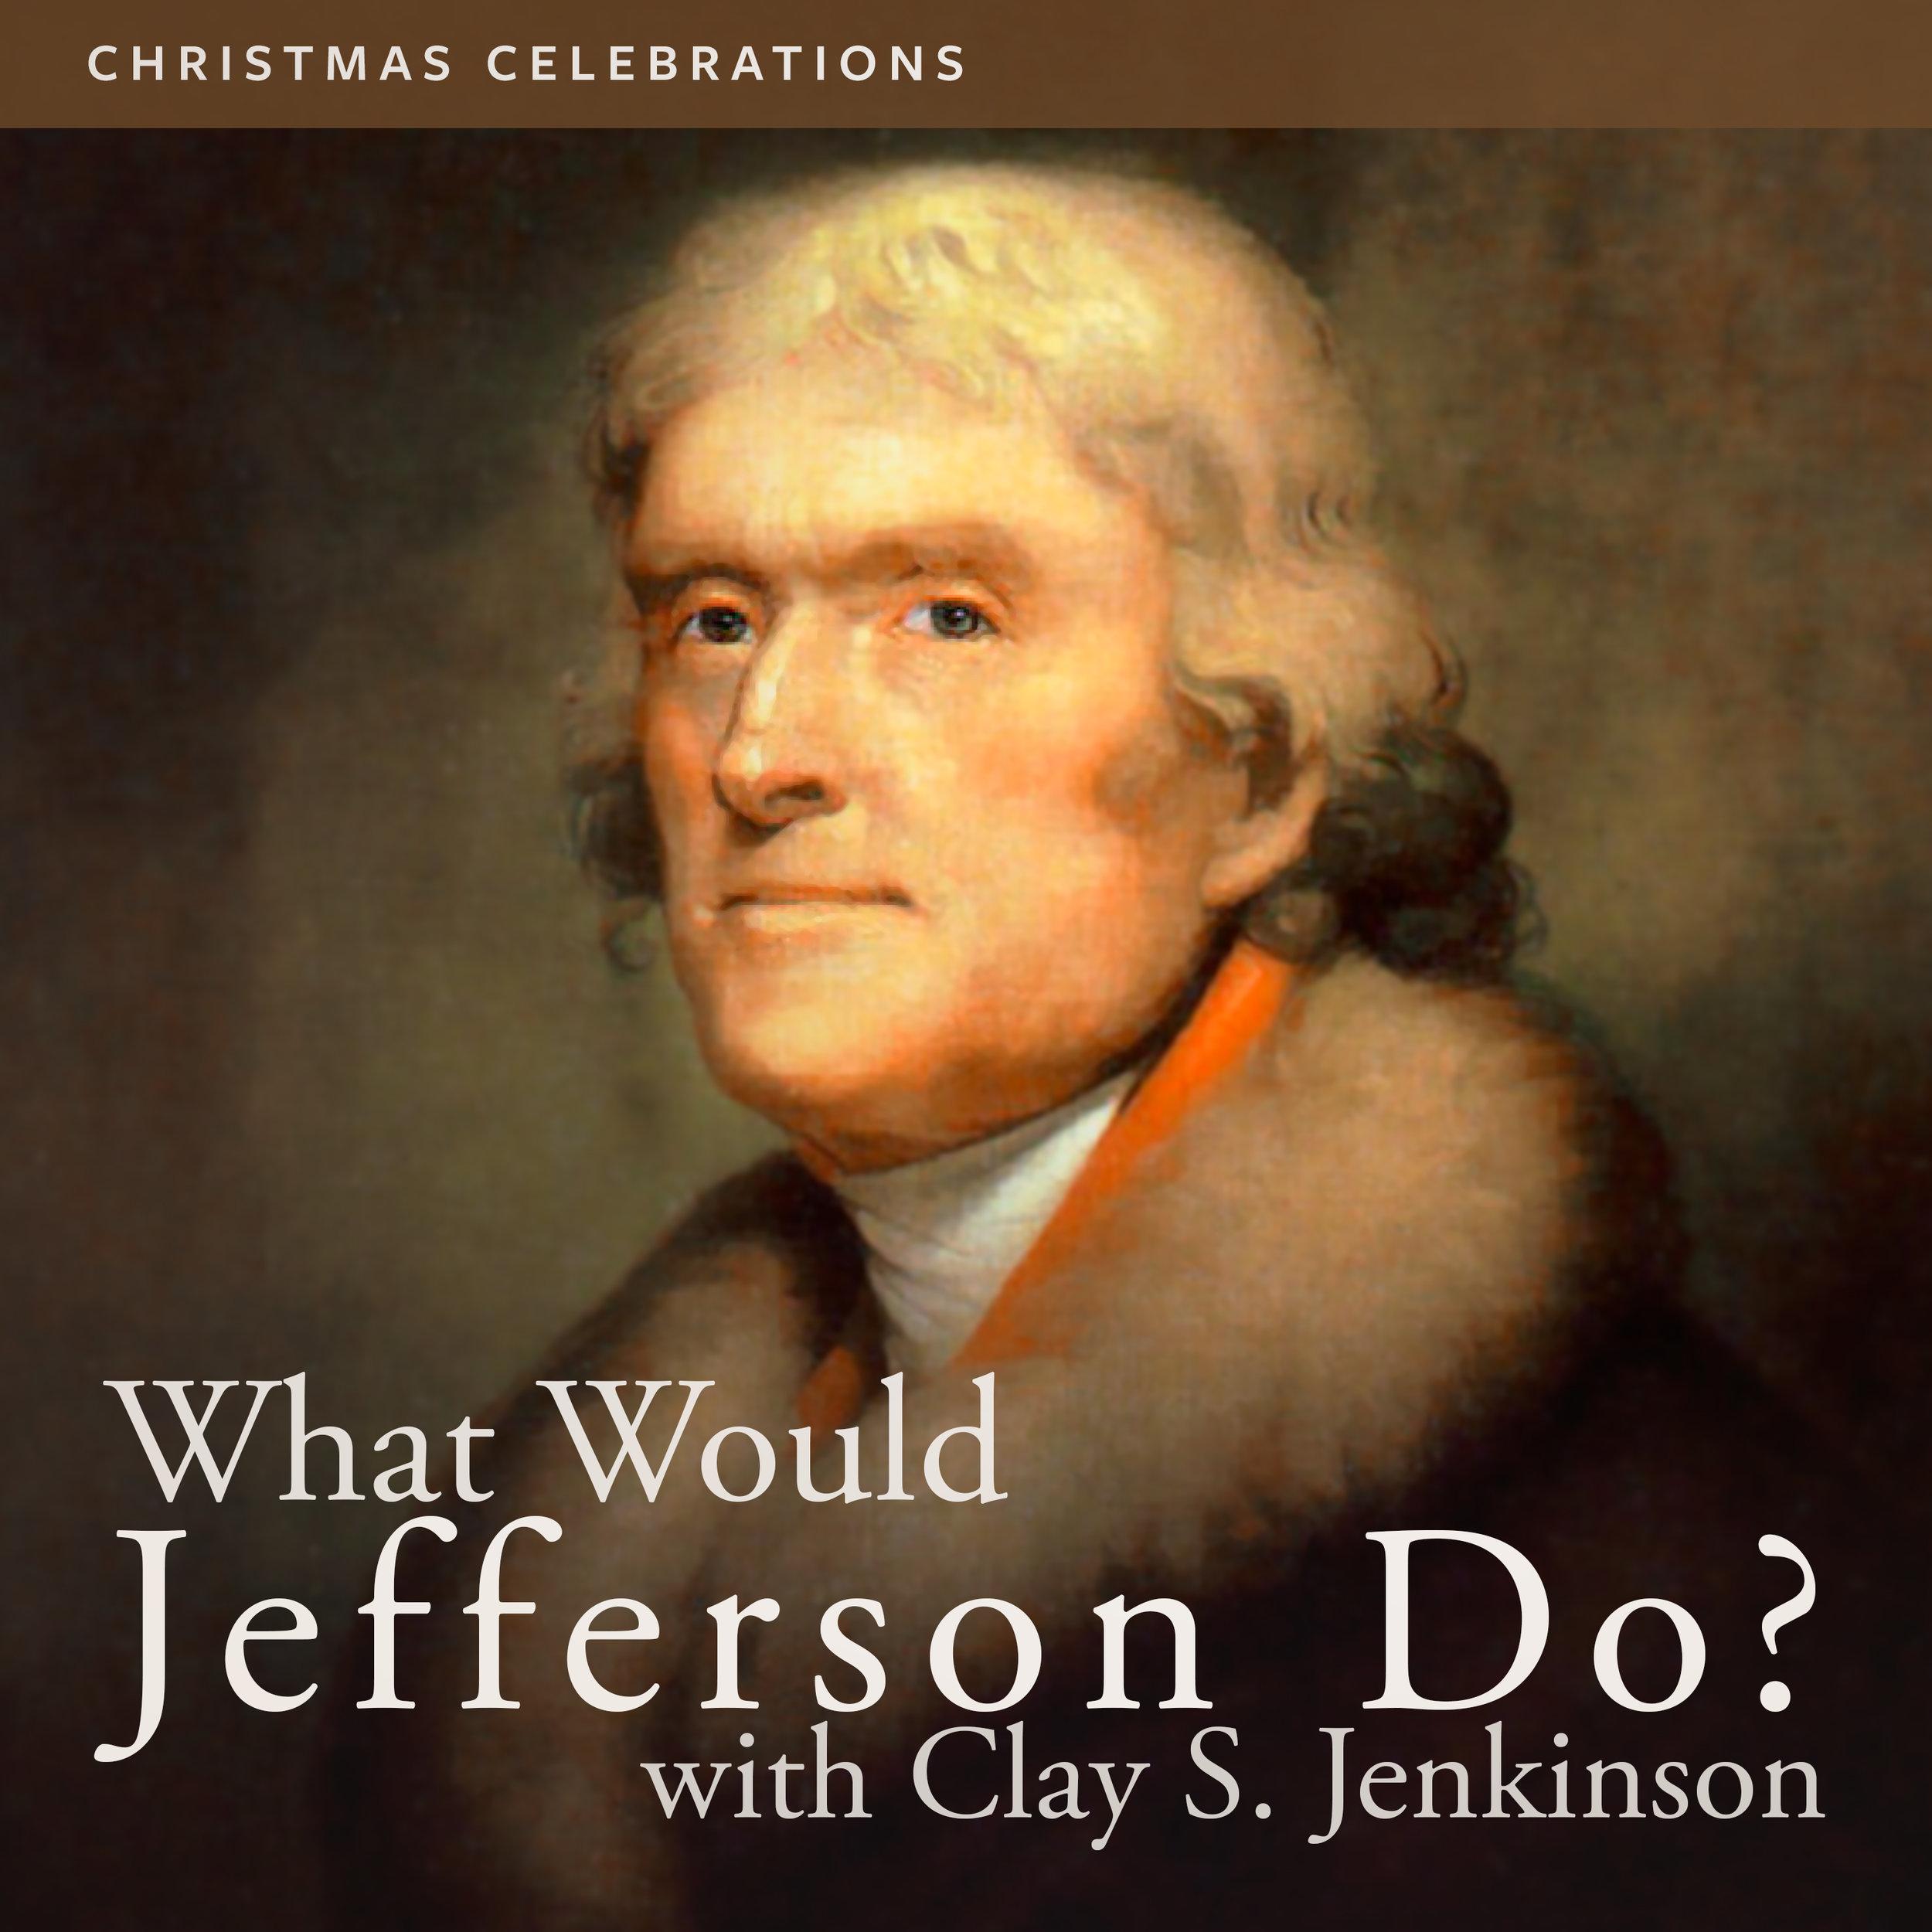 WWTJD_1318 Christmas Celebrations.jpg